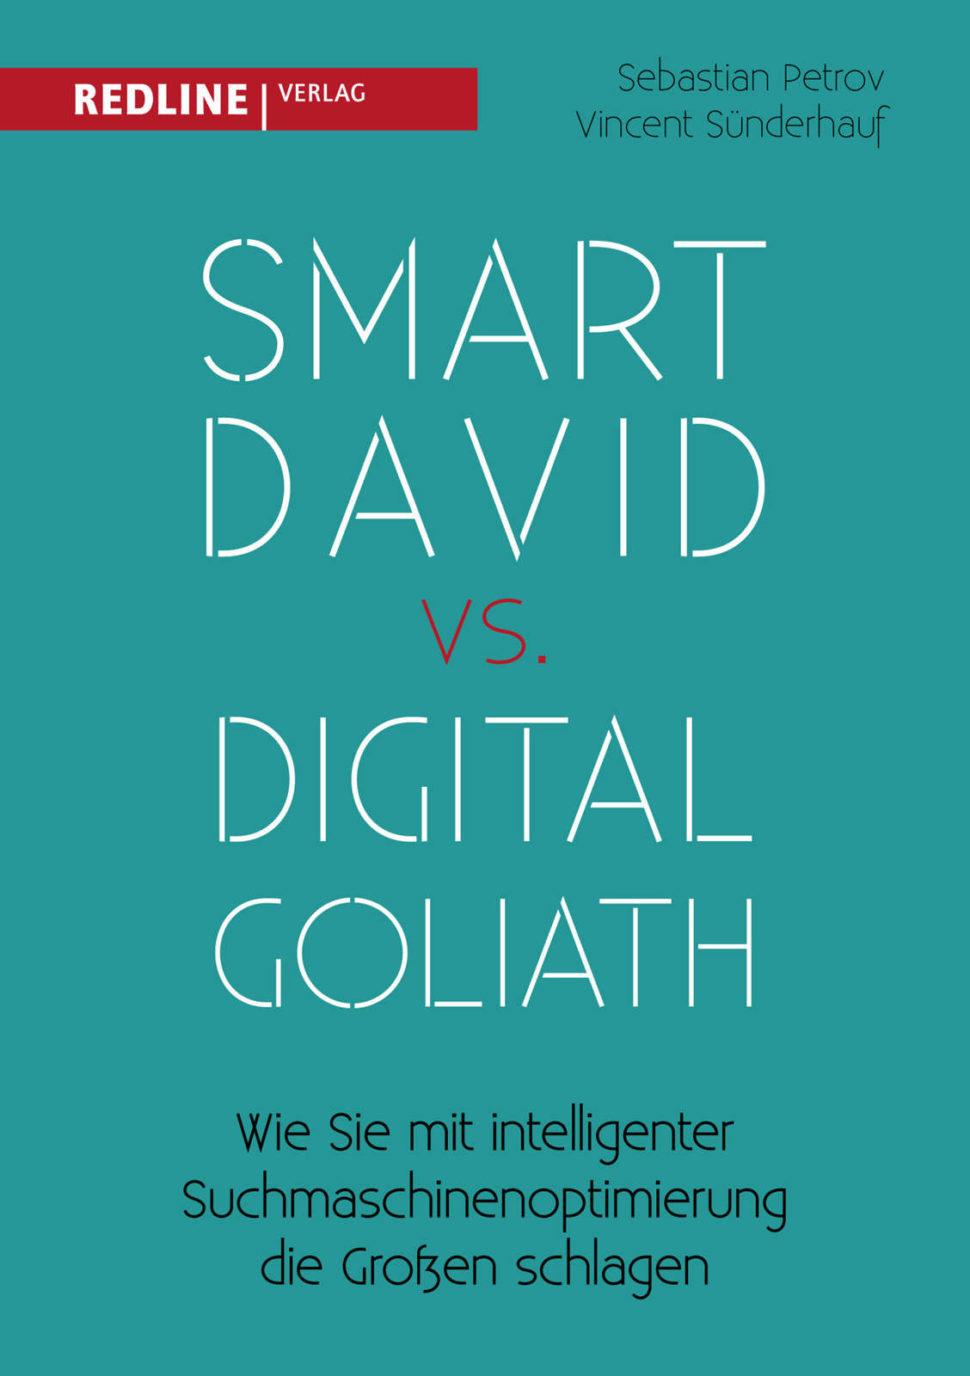 Smart David vs. Digital Goliath